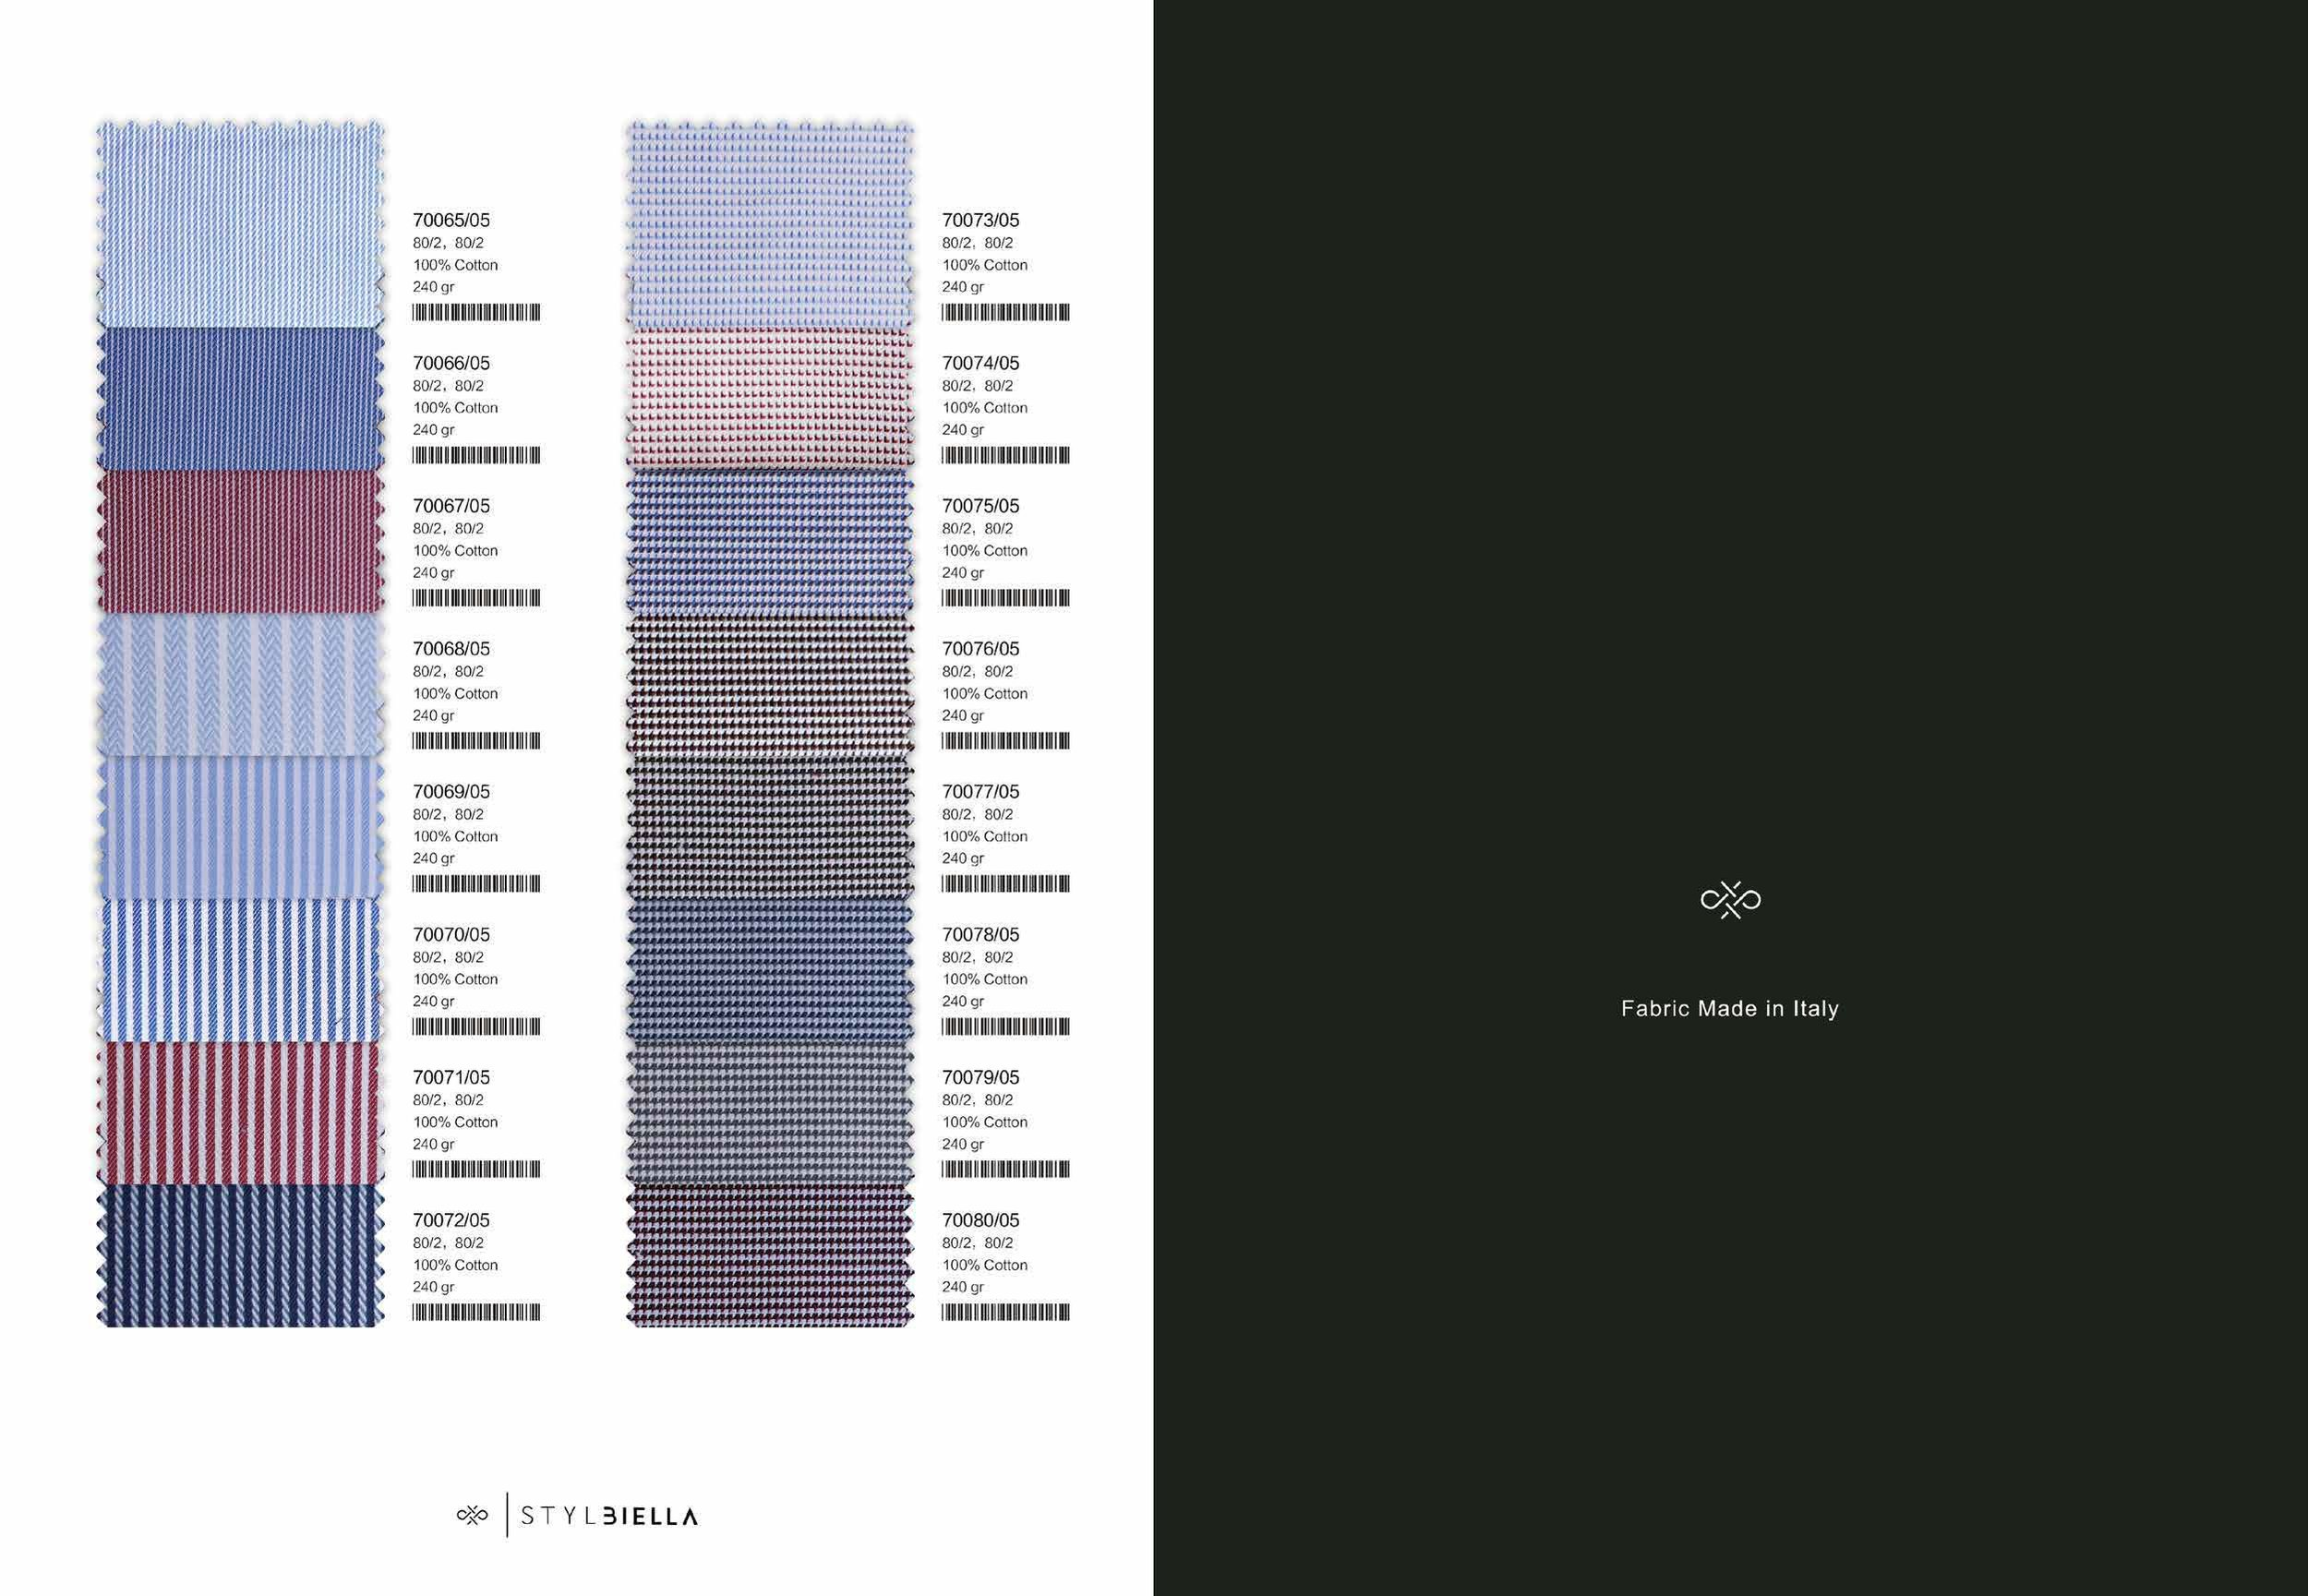 STB fabric 5001_Page_54.jpg